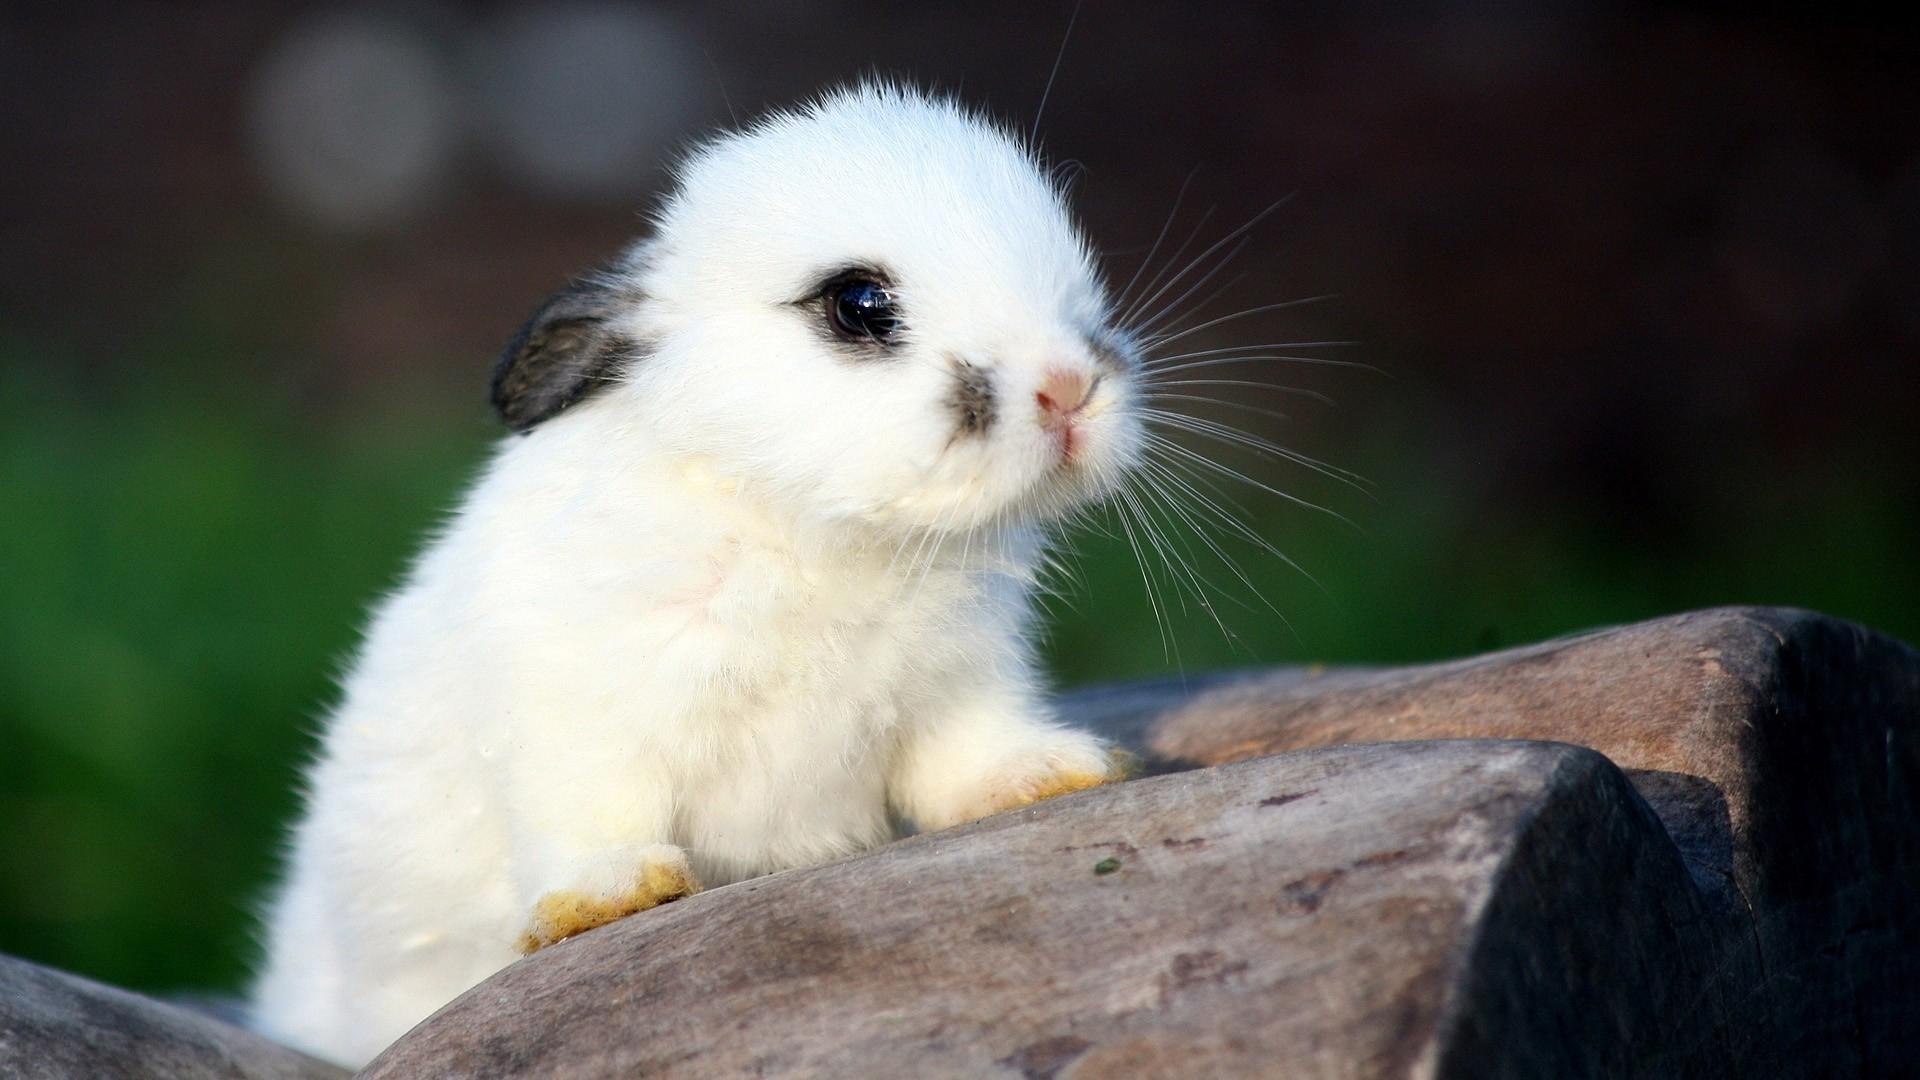 cute baby animal wallpaper 34420 1920x1080 px ~ hdwallsource